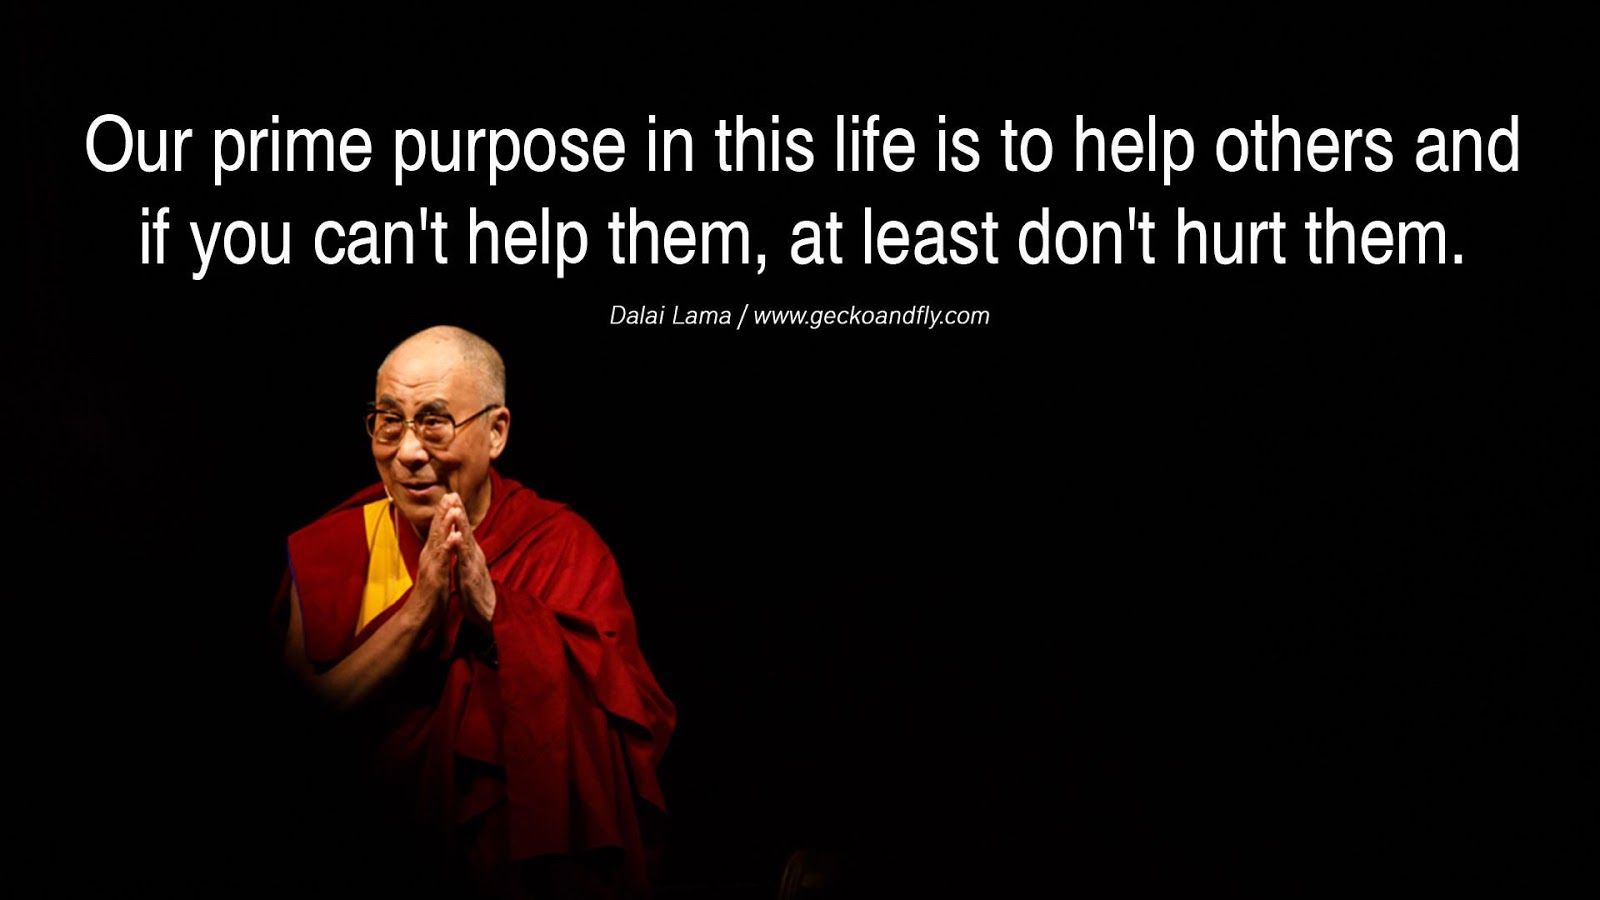 The 14th Tibetan Dalai Lama